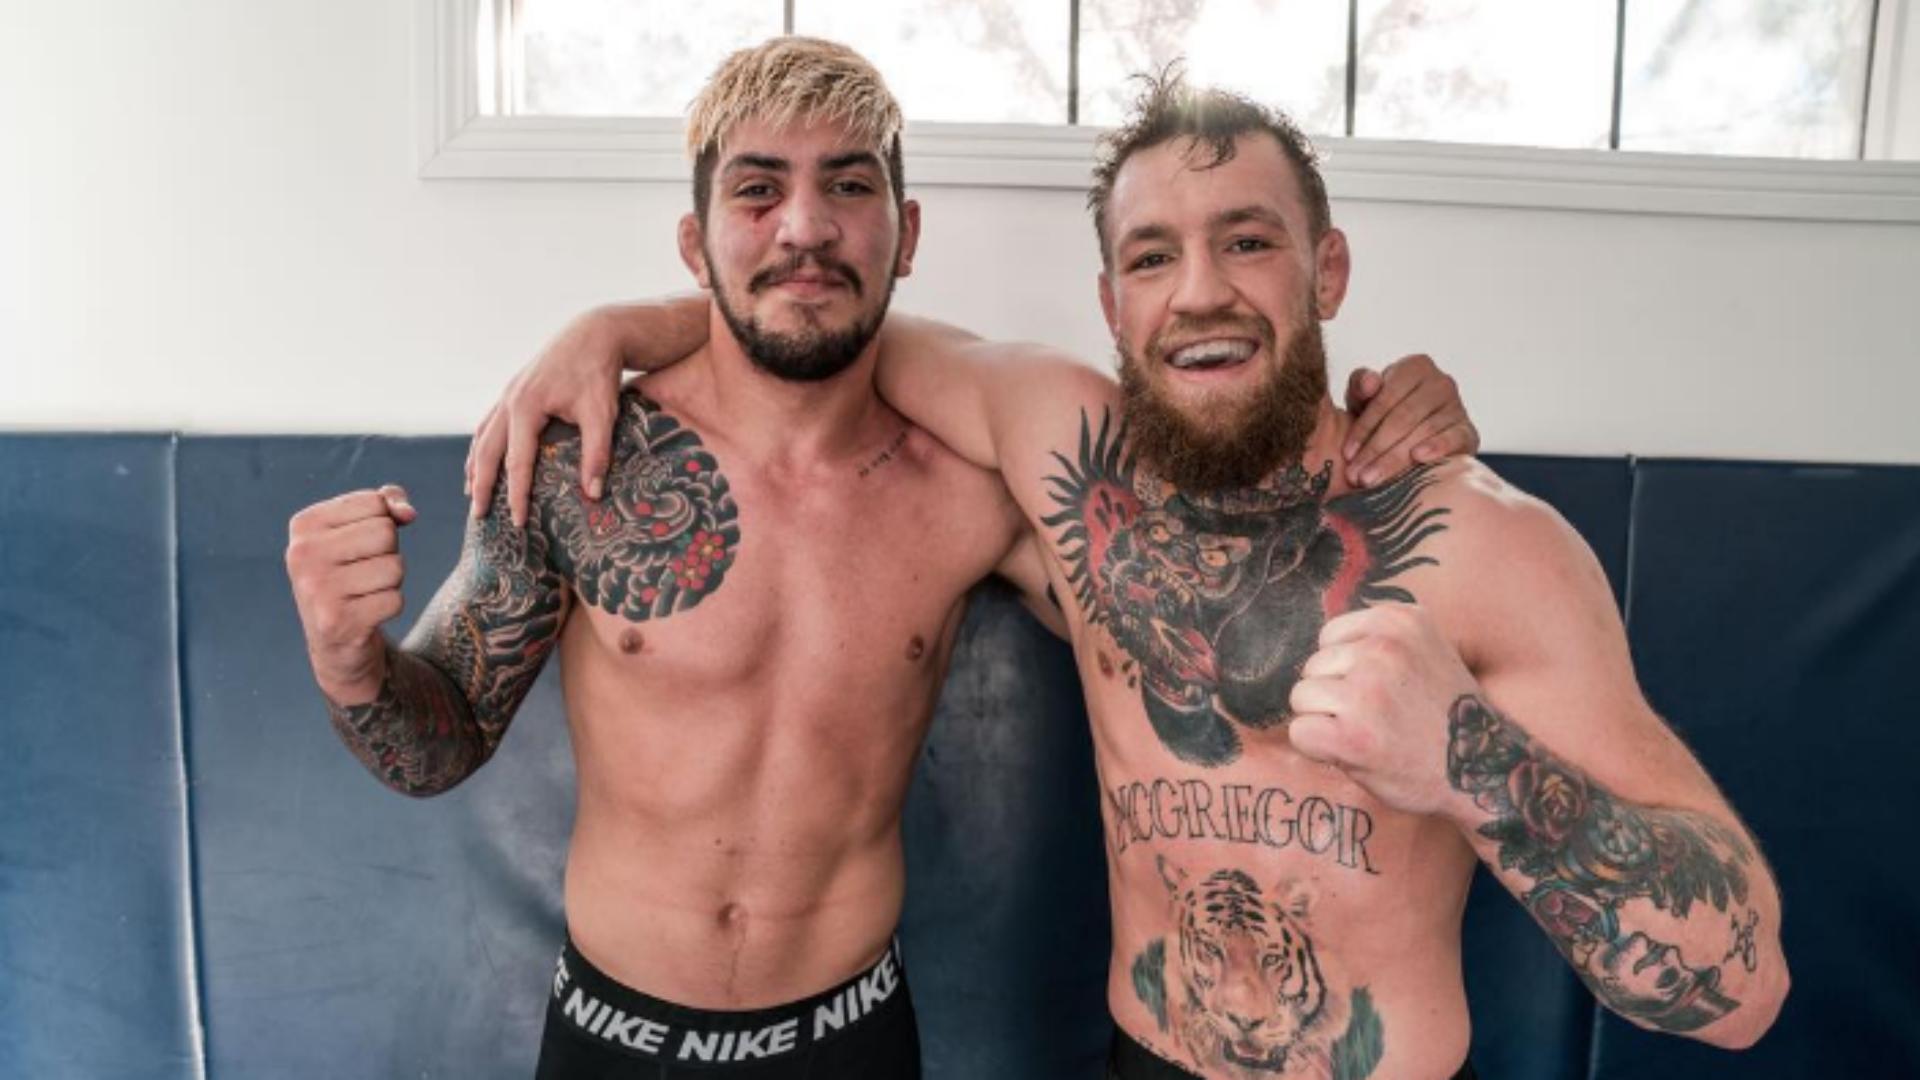 UFC 229: Conor McGregor's teammate Dillon Danis calls out former lightweight champ Rafael dos Anjos after UFC 229 chaos   Sporting News Australia